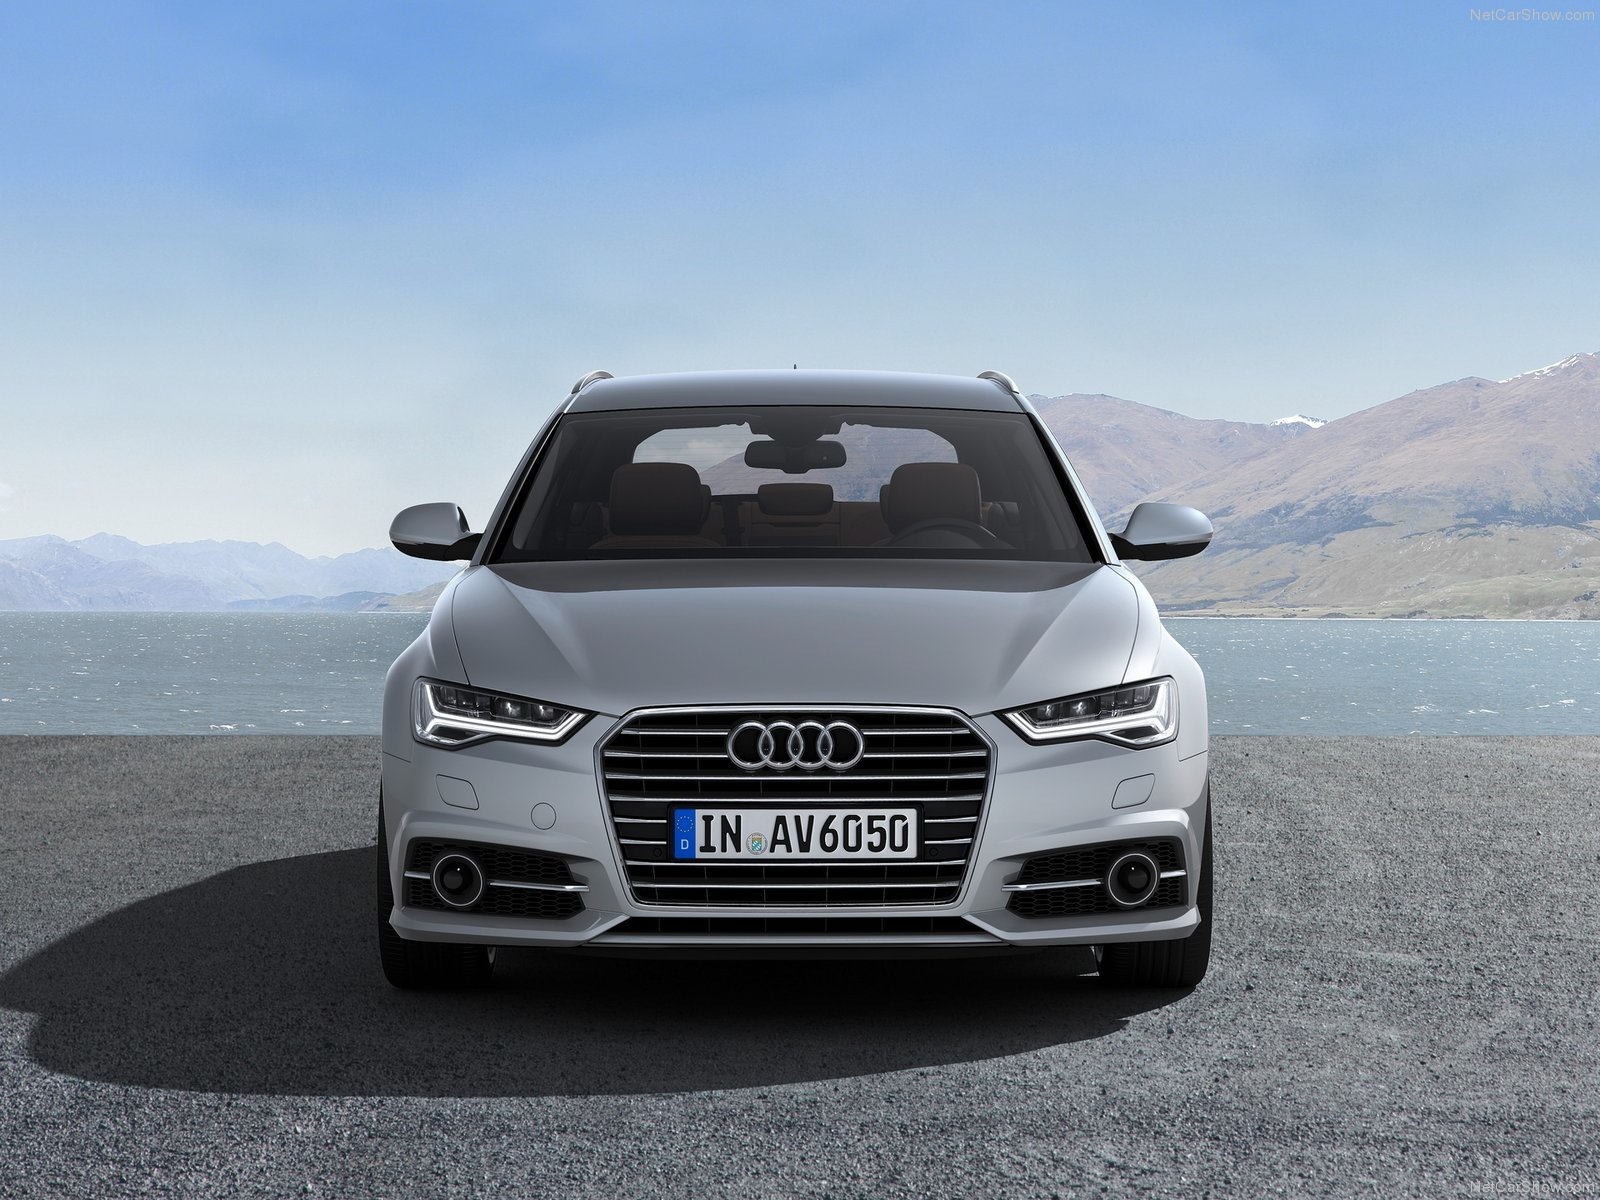 Audi A6 2015 (9/12)